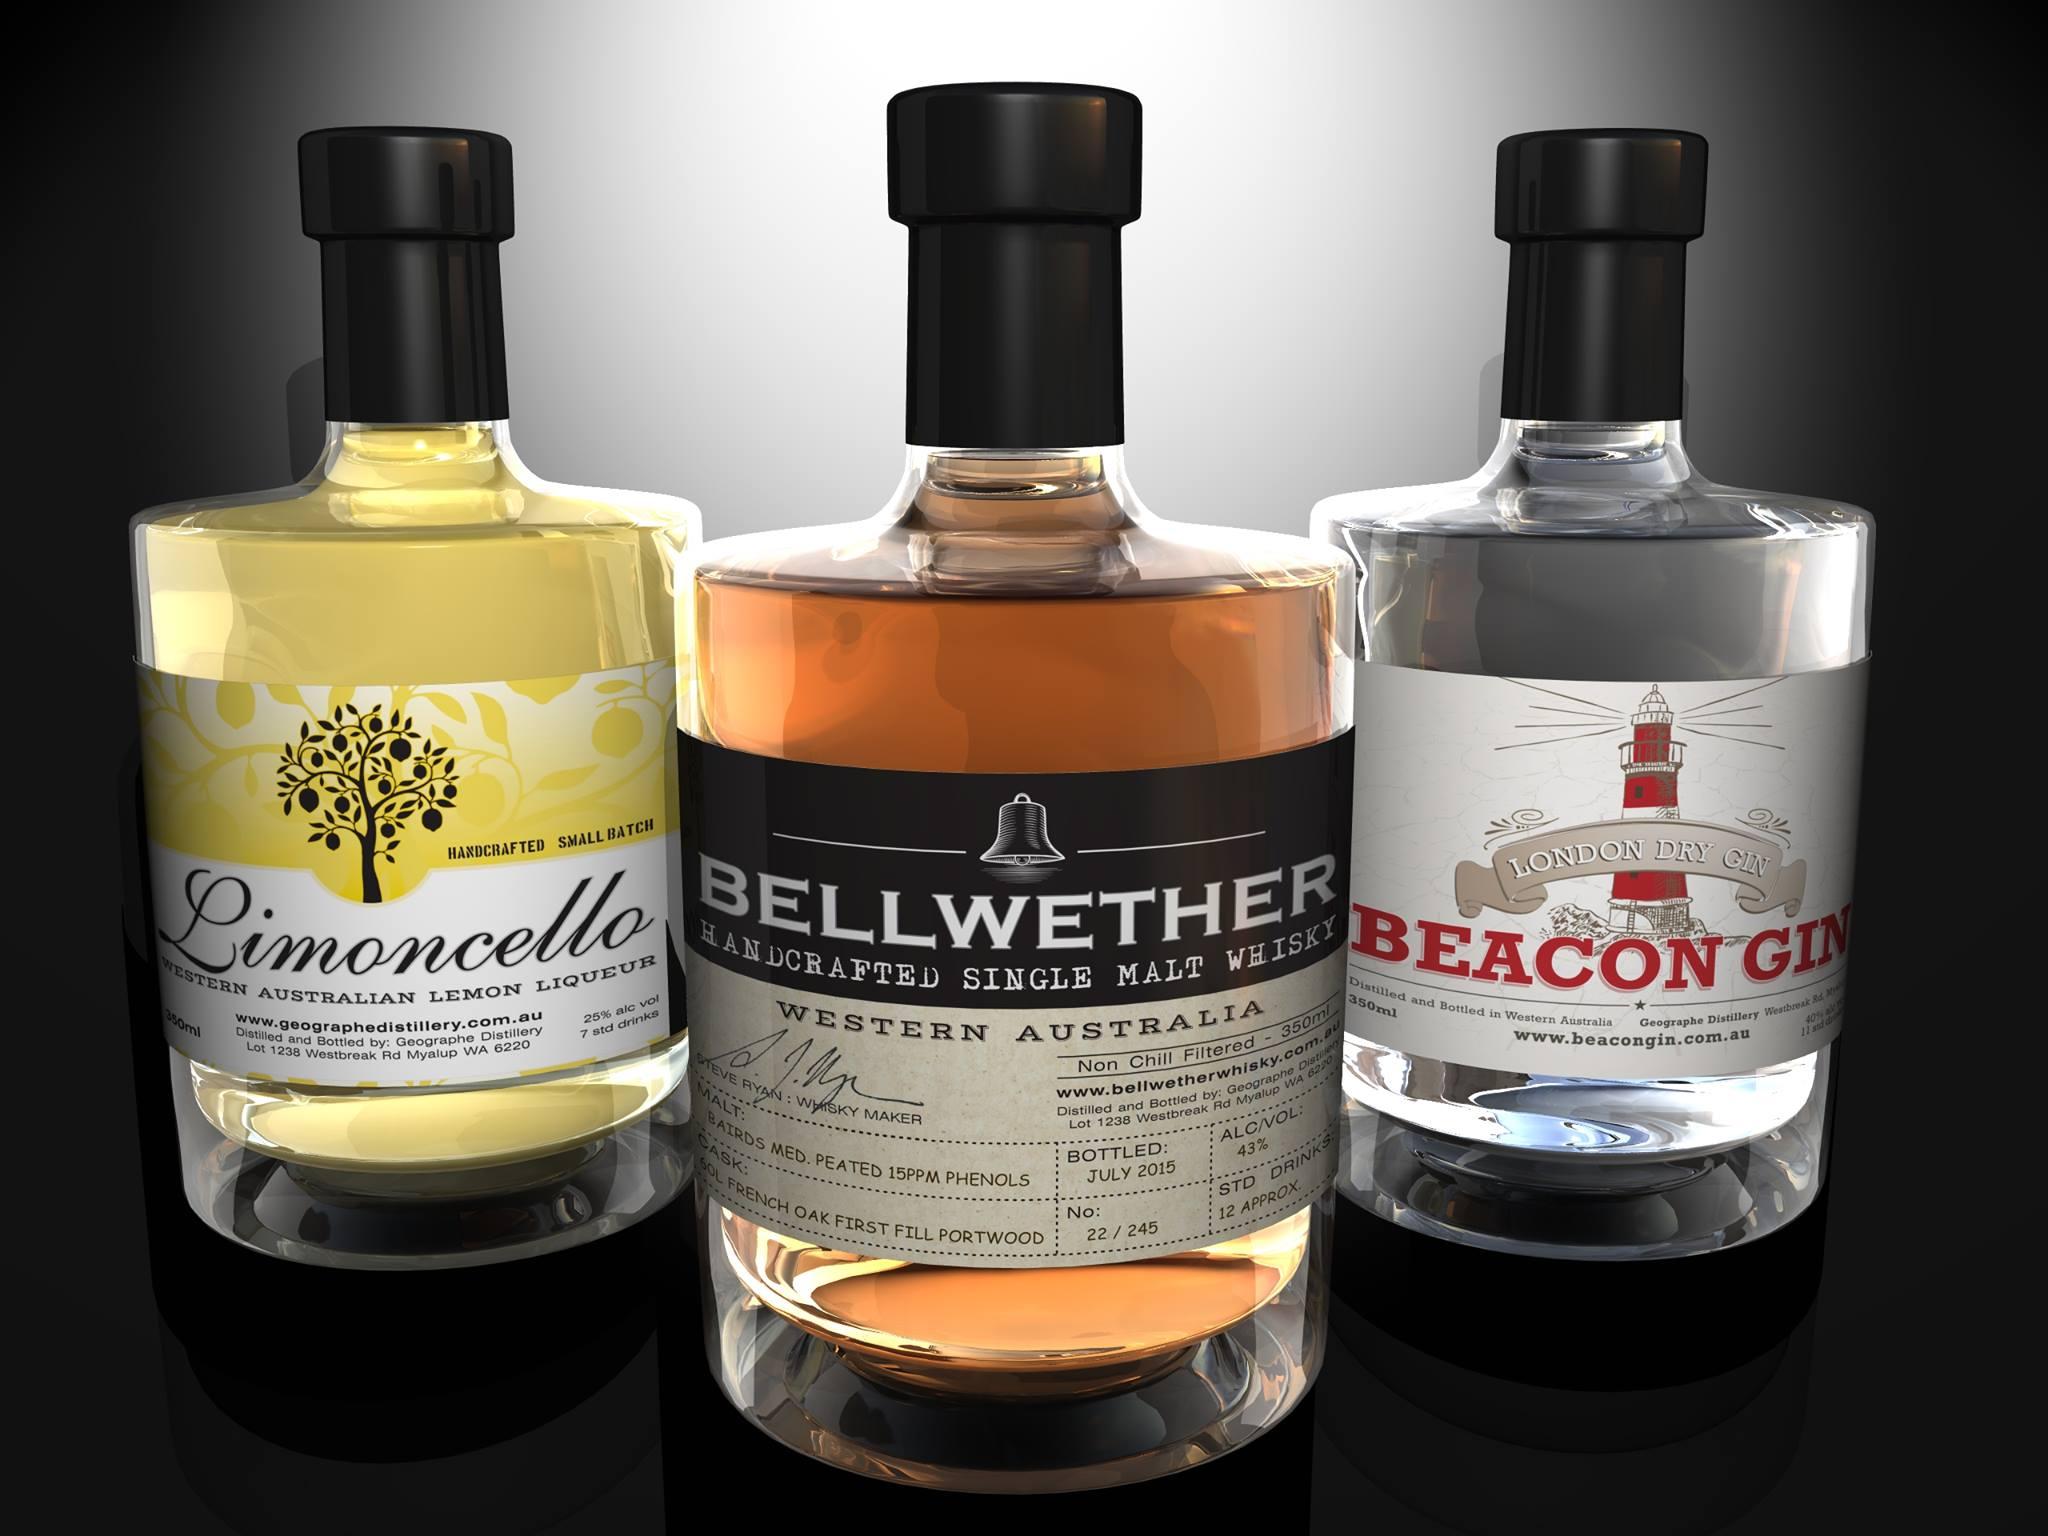 geographe distillery